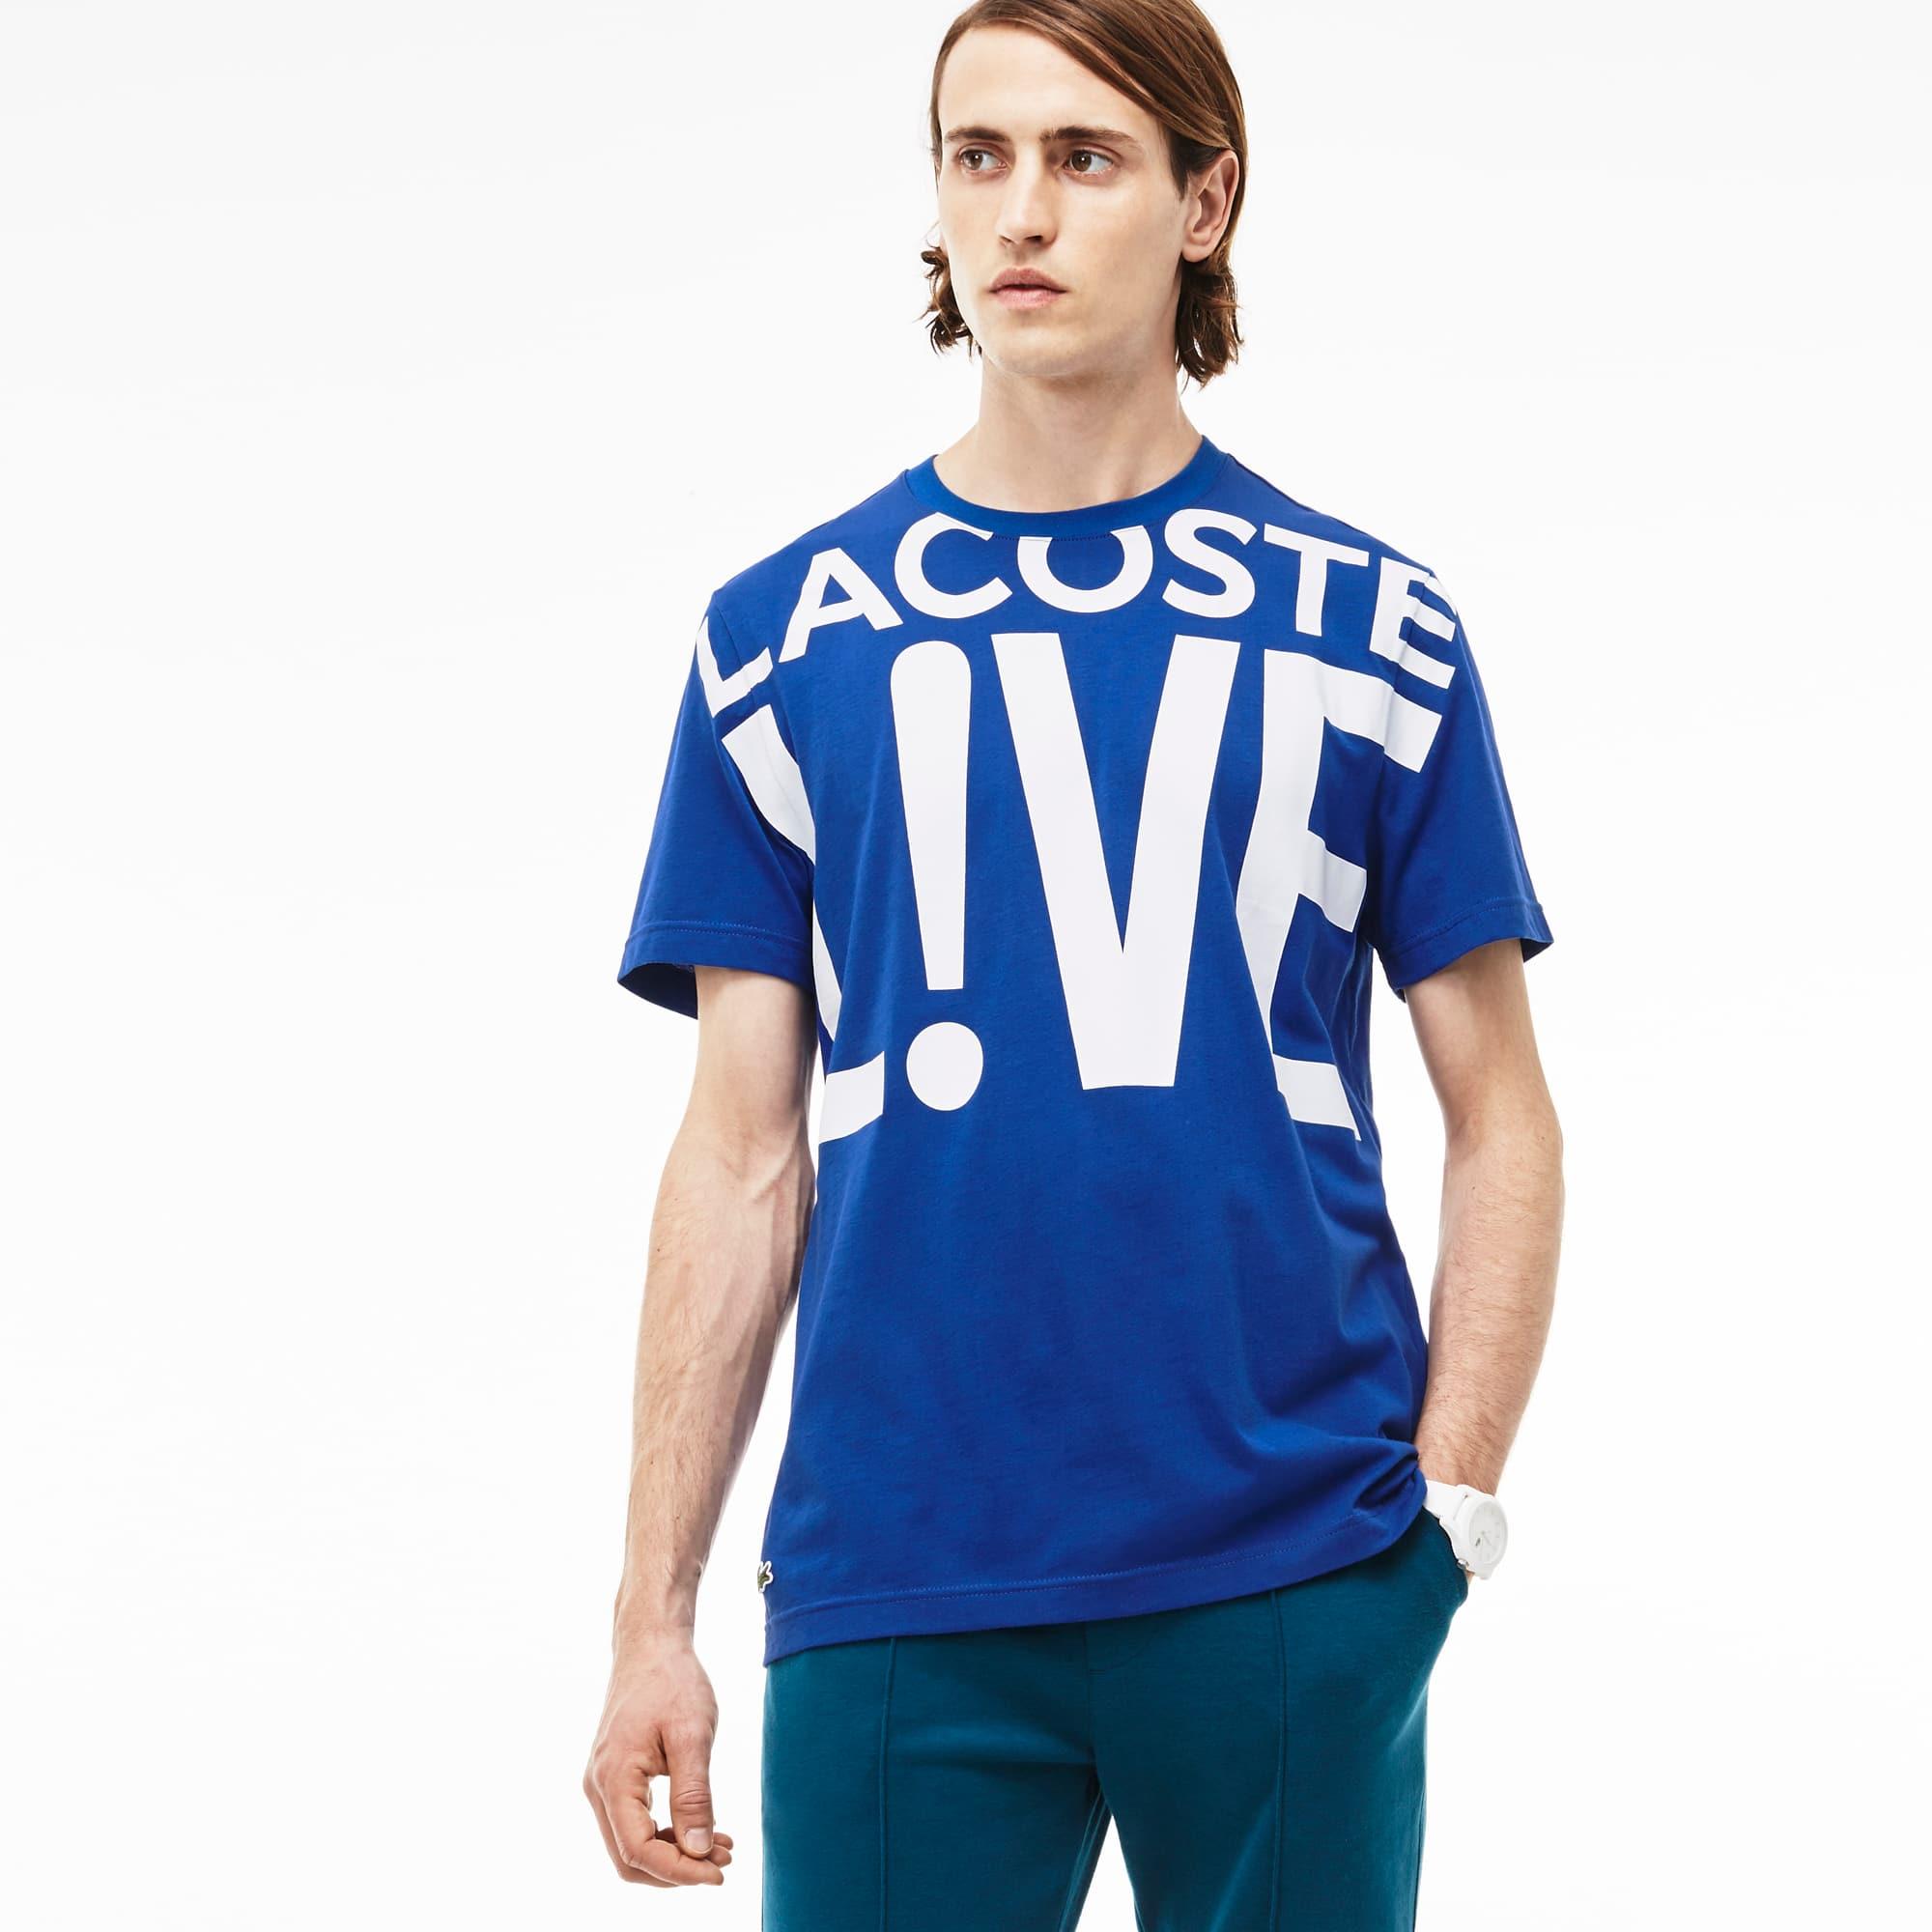 Camiseta Lacoste LIVE ultra-slim fit com gola redonda e estampa